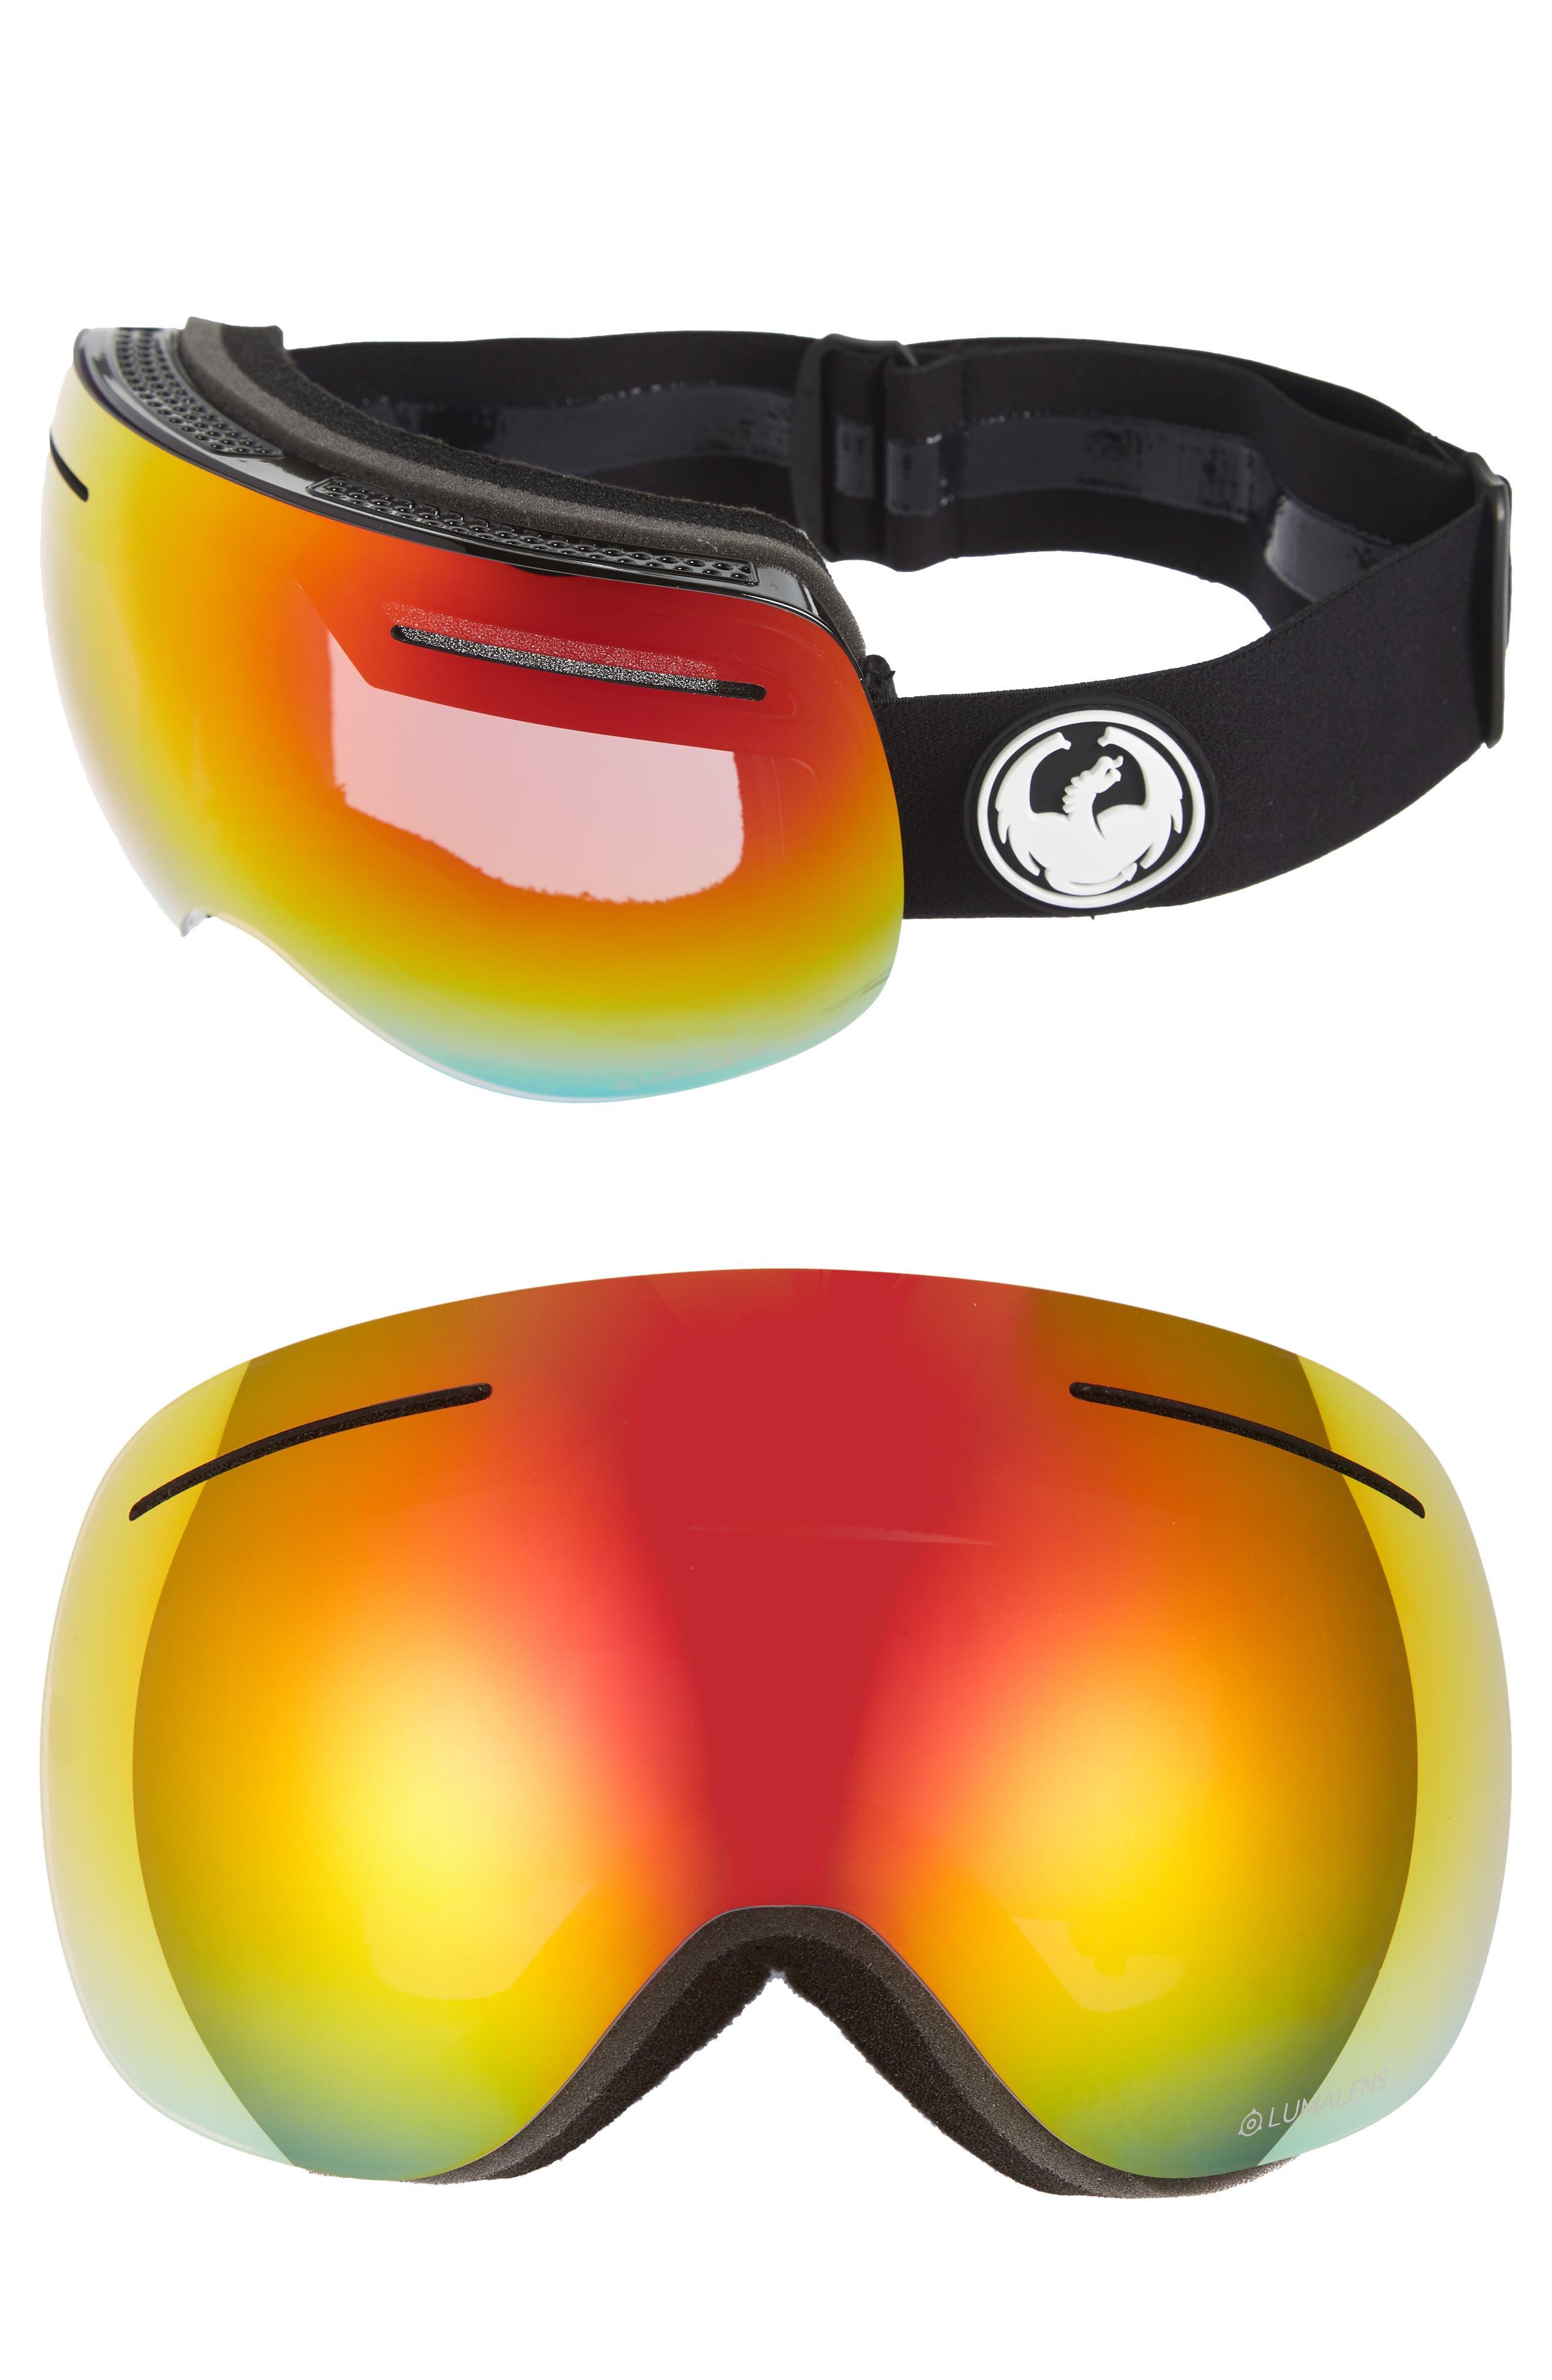 X1 Frameless Snow Goggles